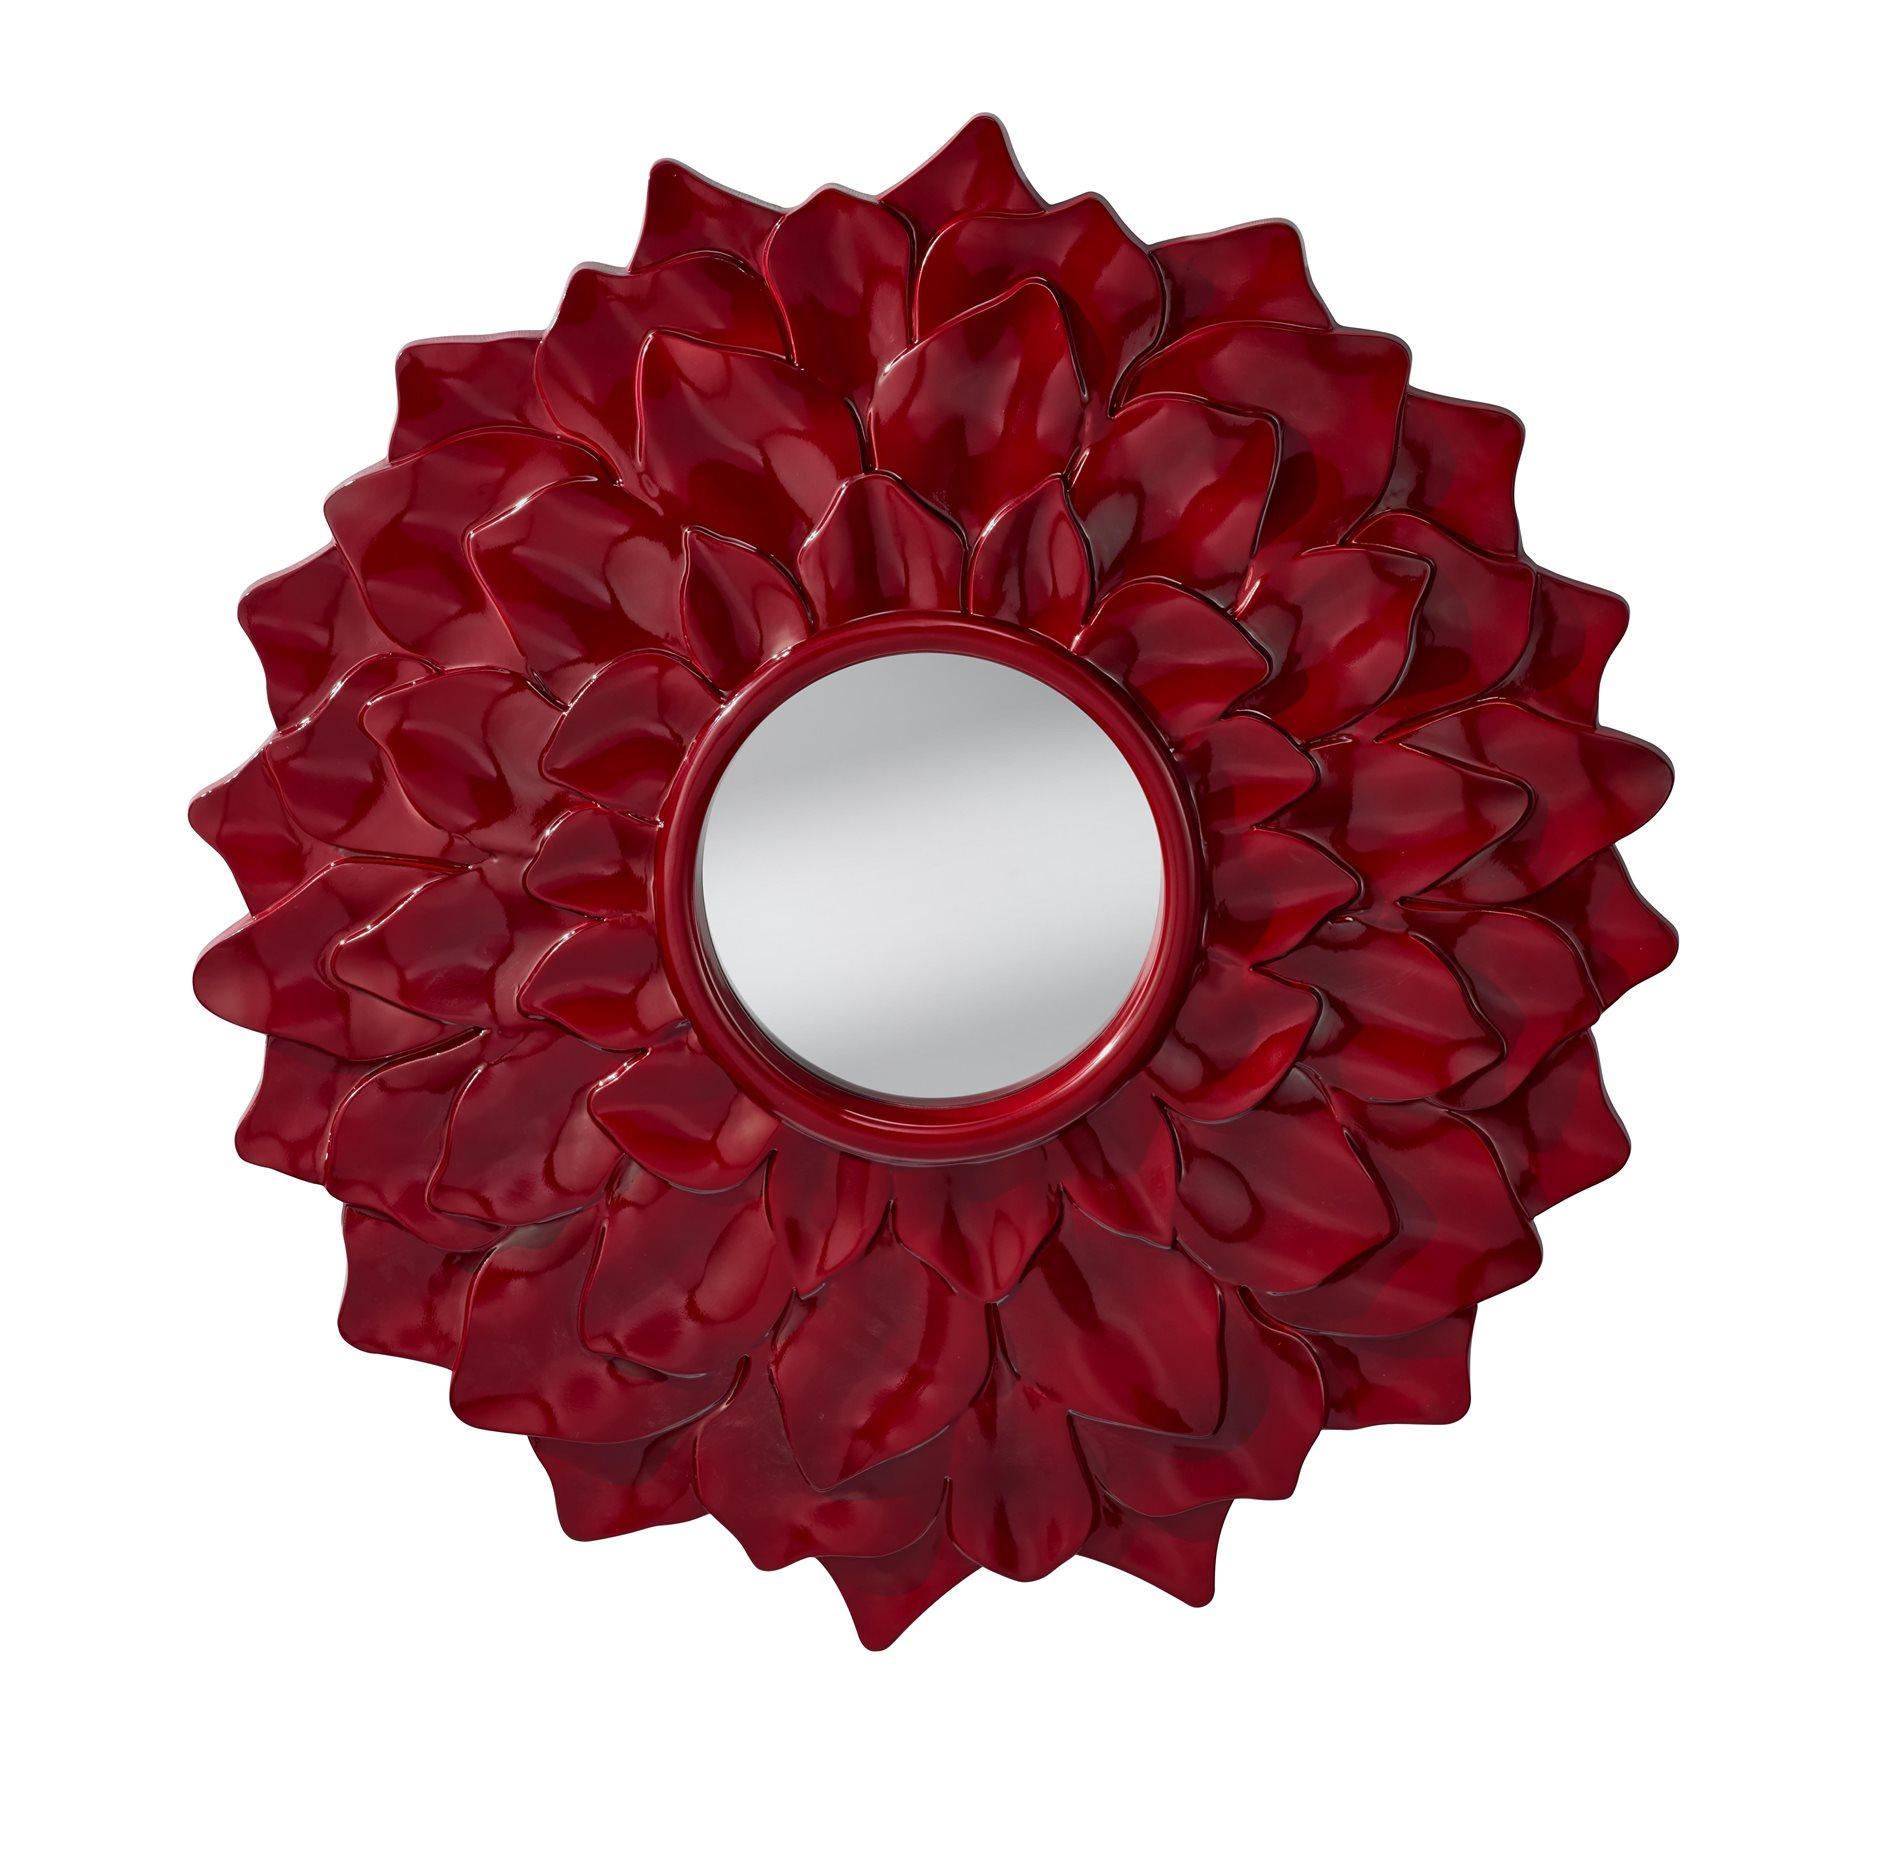 Murray Feiss Mirrors: Murray Feiss MR1215CRML Ambrosia Mirror MRF-MR1215CRML